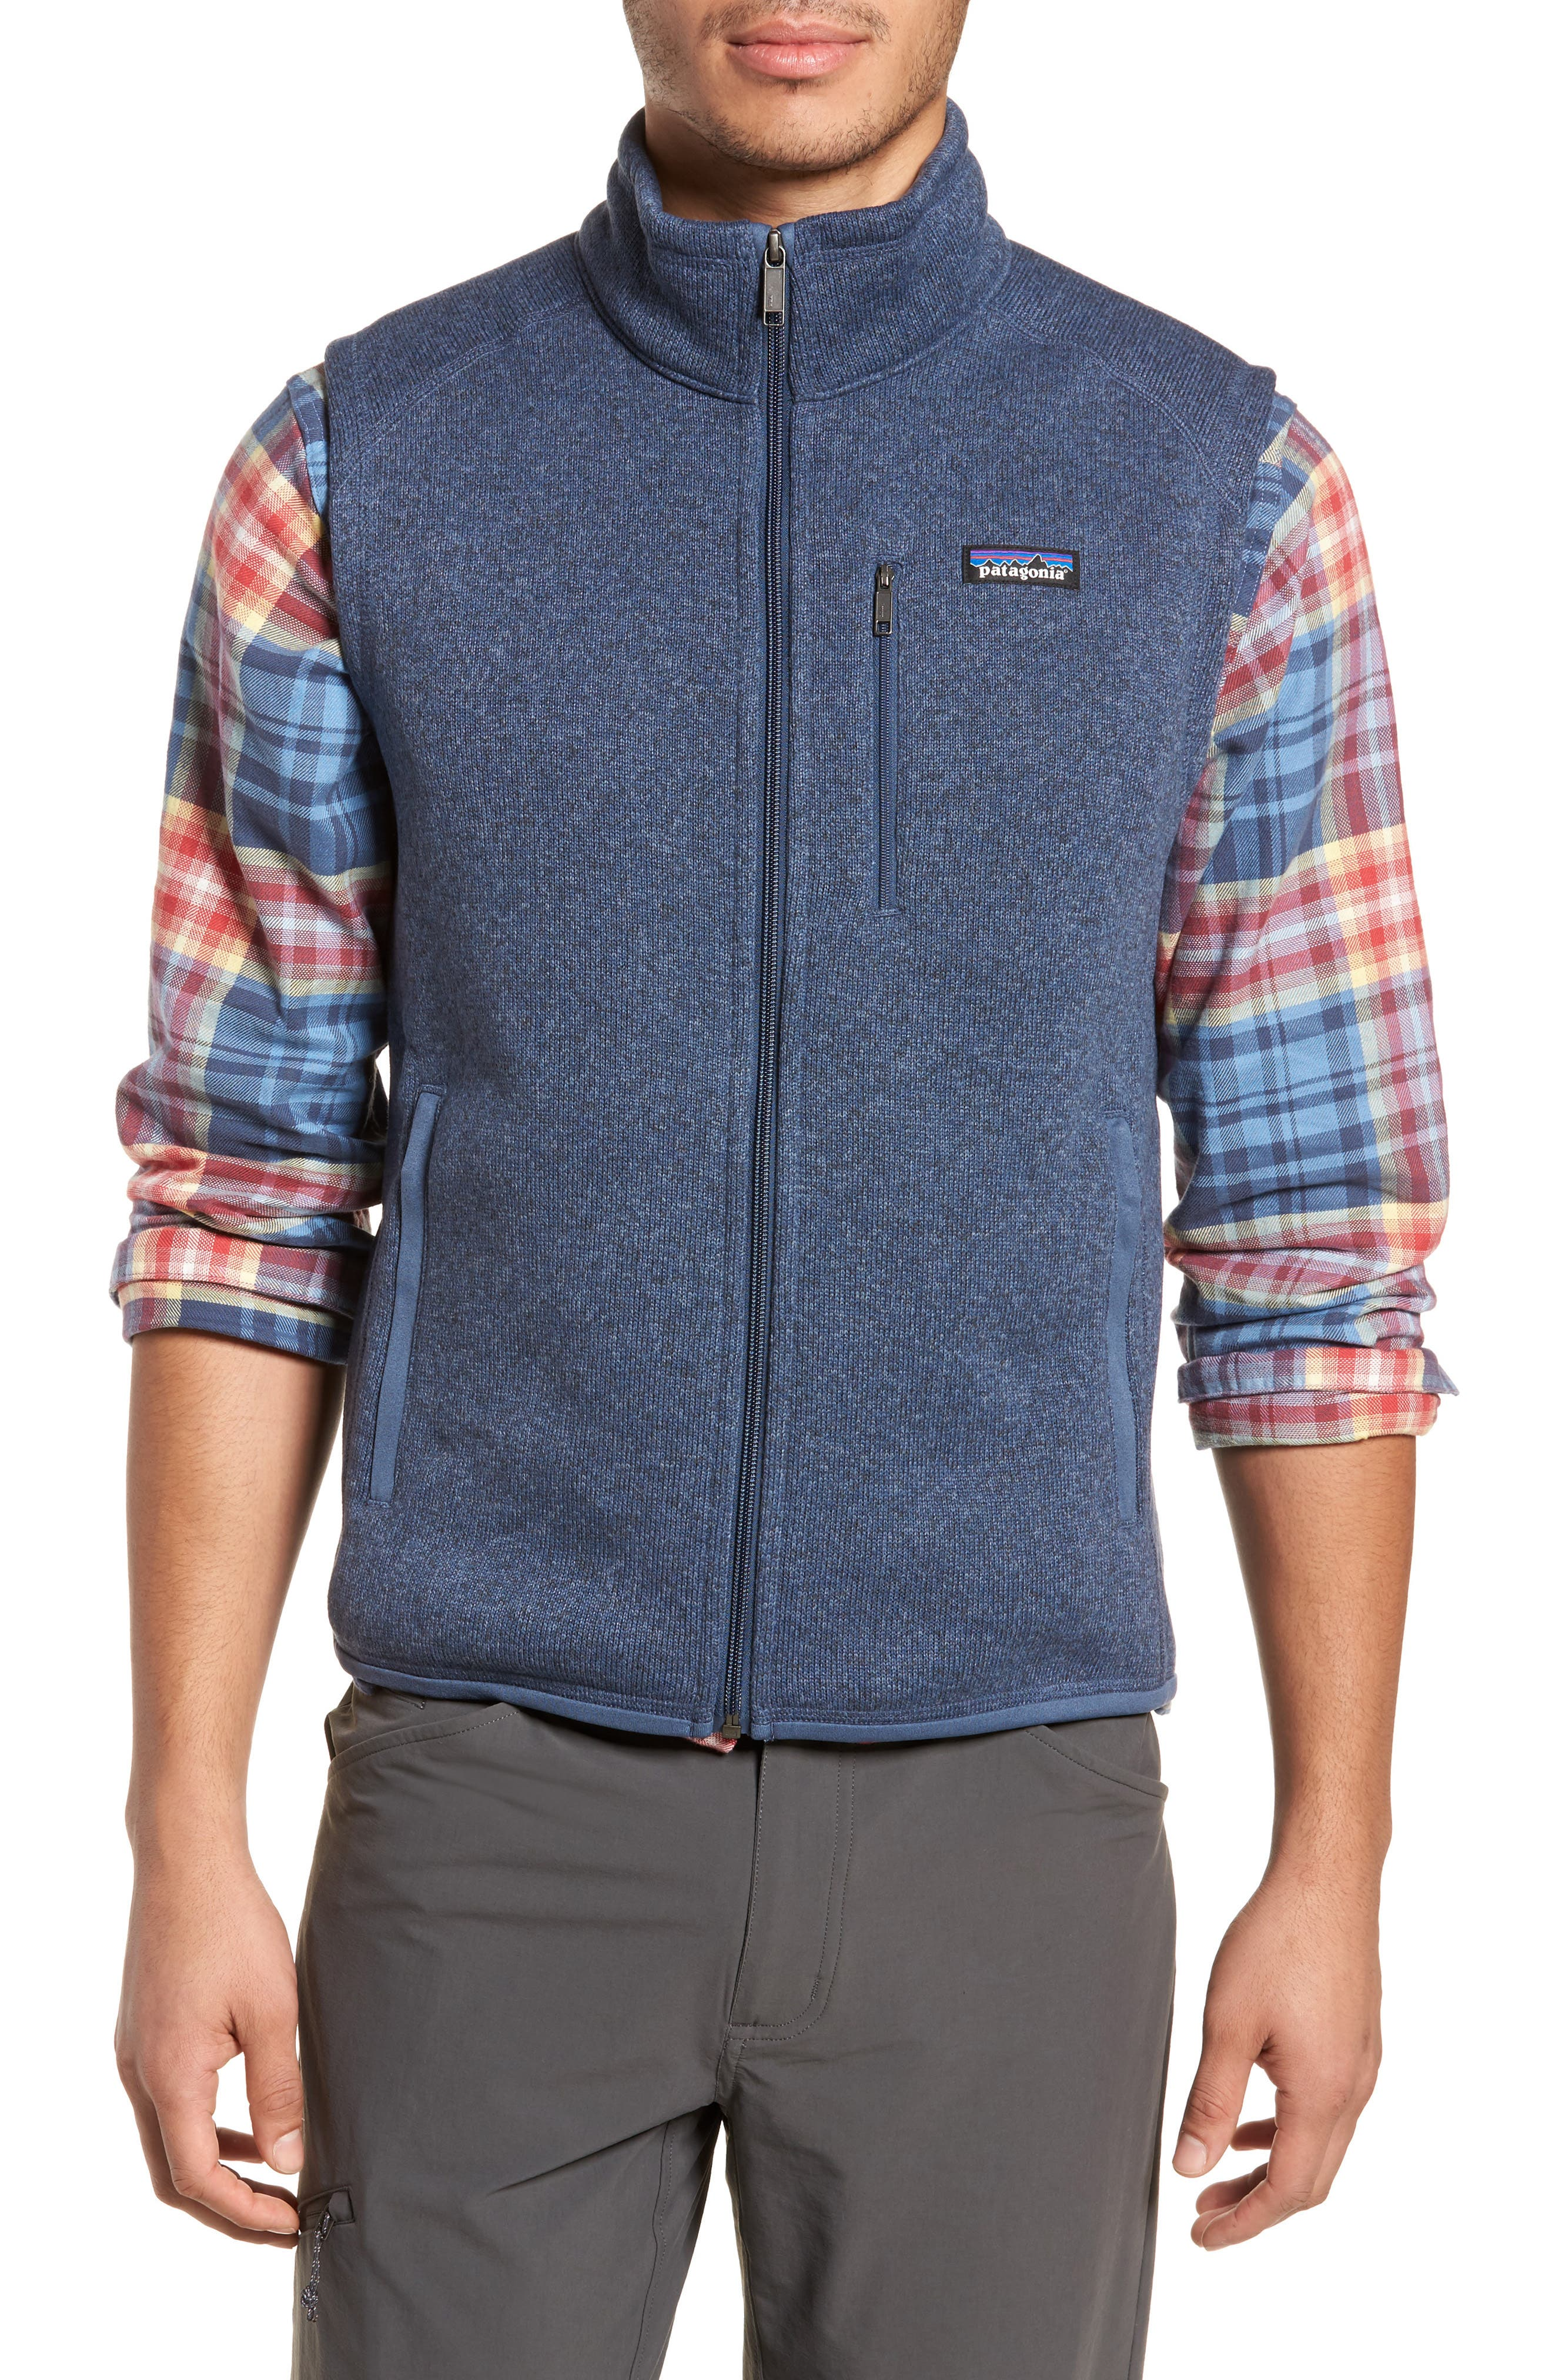 PATAGONIA, 'Better Sweater' Zip Front Vest, Alternate thumbnail 4, color, DOLOMITE BLUE